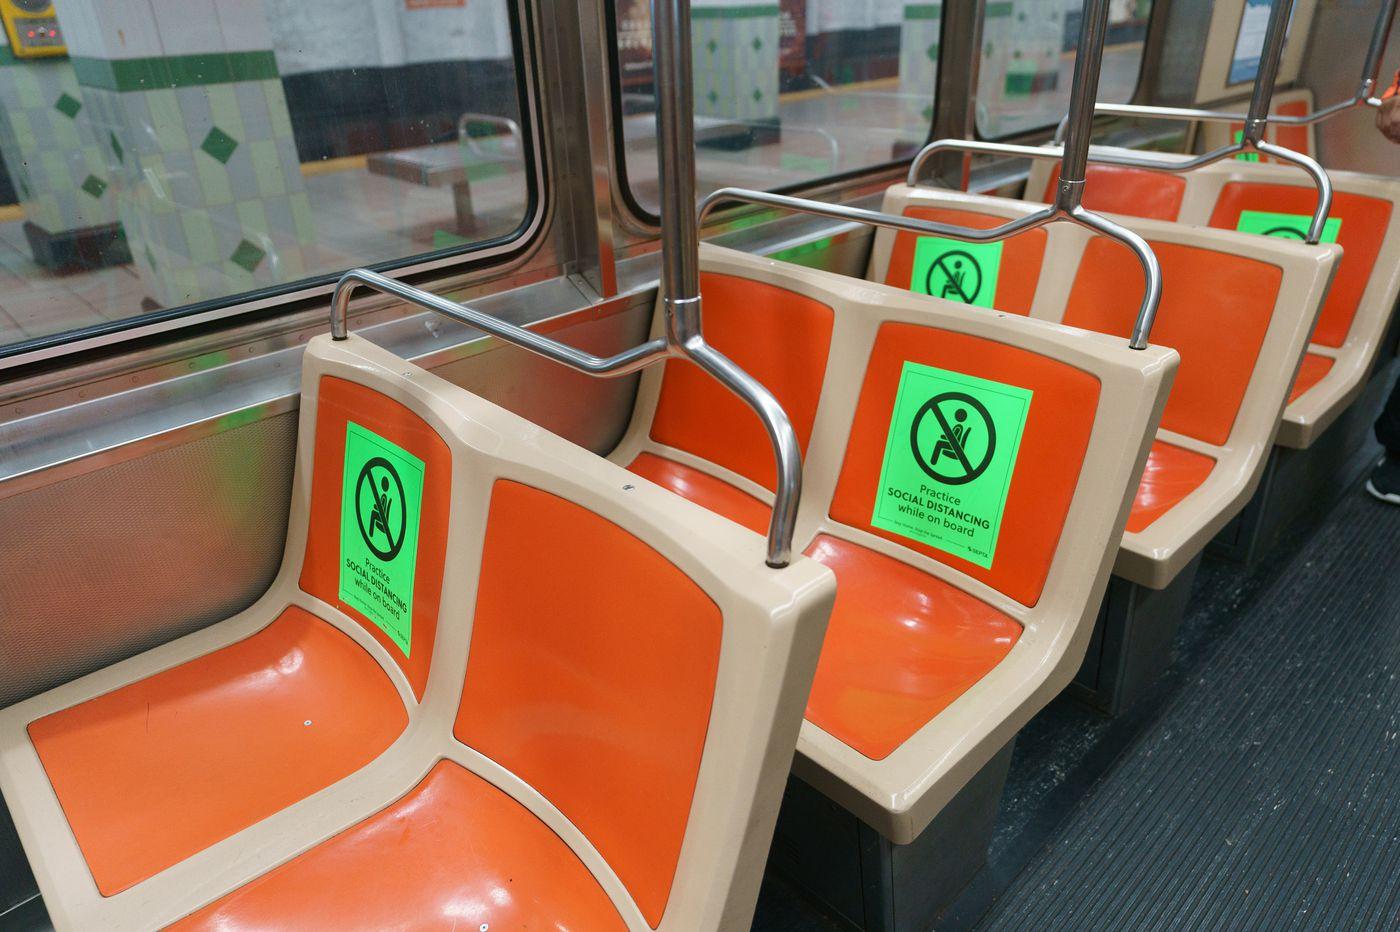 SEPTA's mass transit doomsday scenario will undermine Philly region's economic future | Editorial